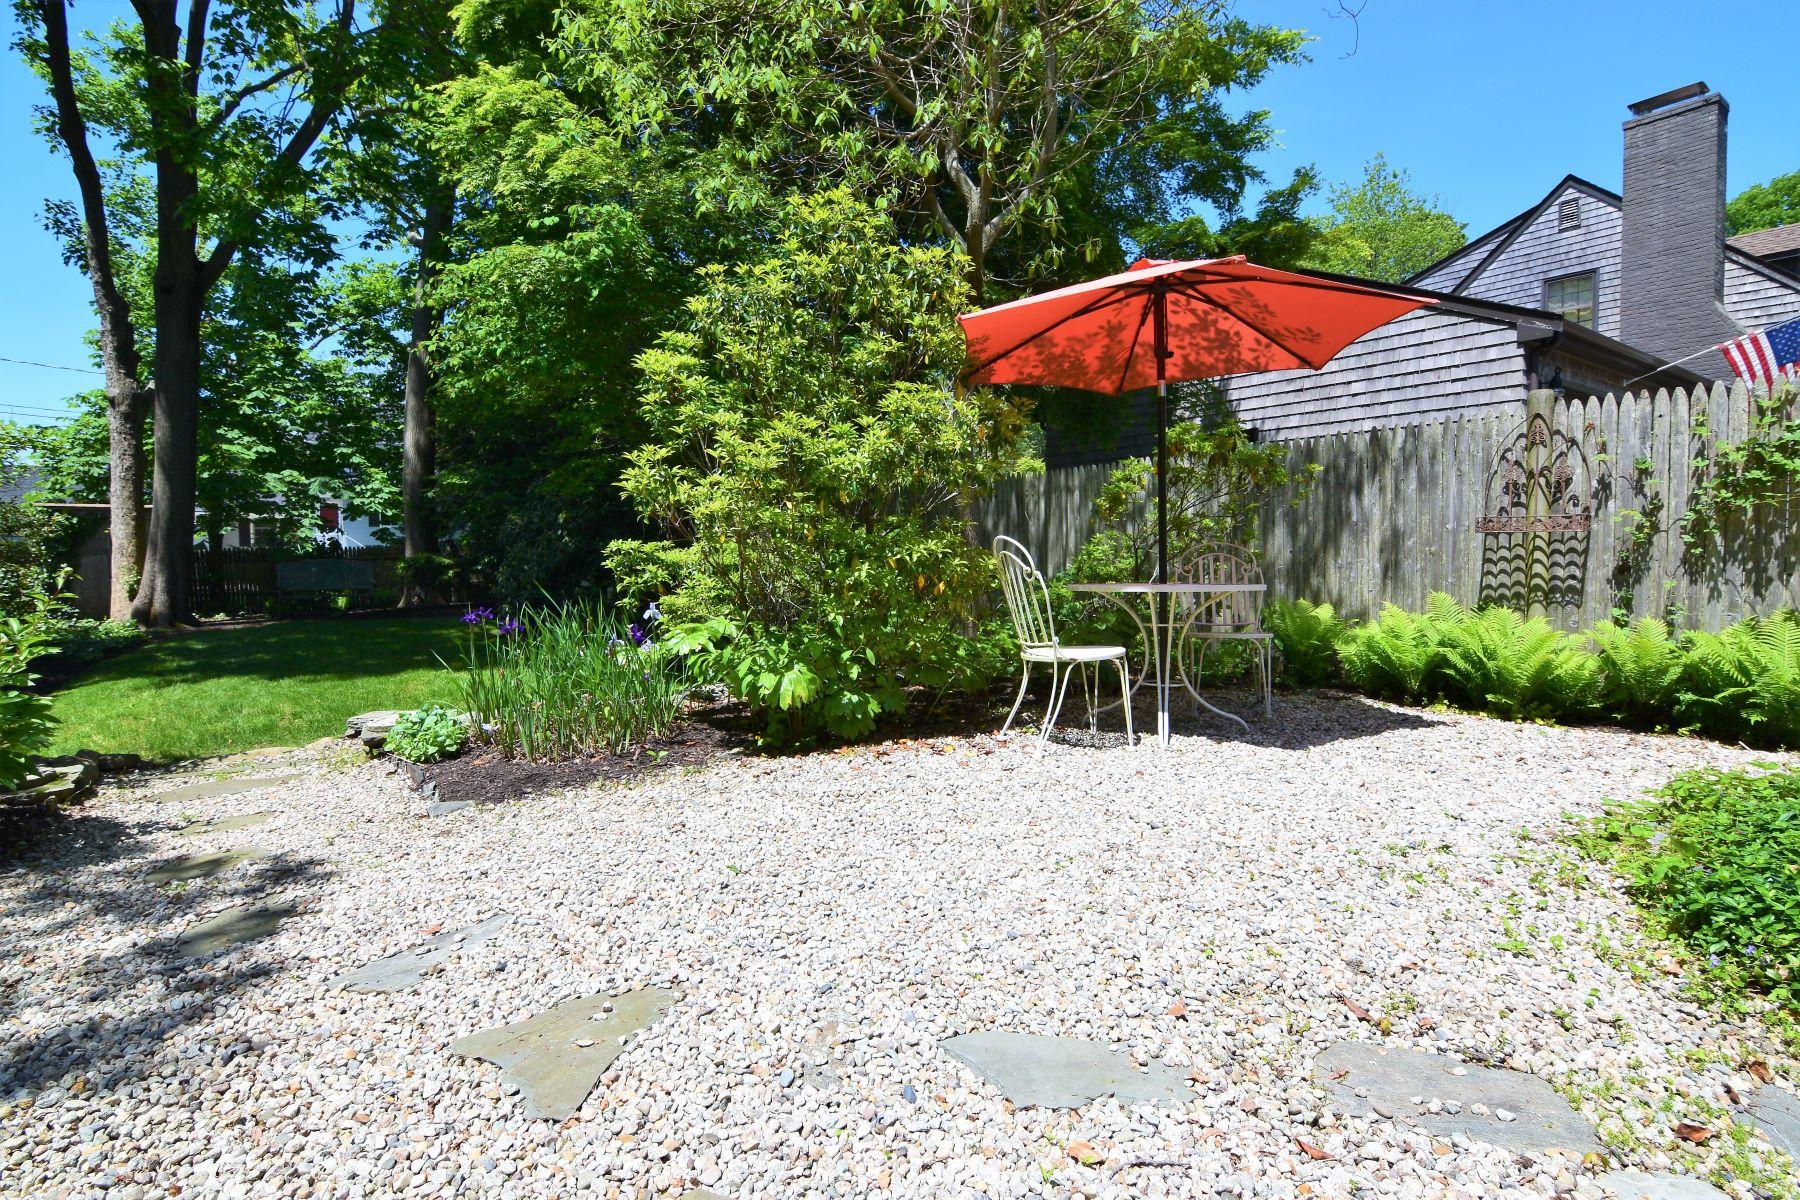 Additional photo for property listing at 'Whitestone' Gardener's Cottage 173 Rhode Island Avenue Newport, Rhode Island 02840 United States